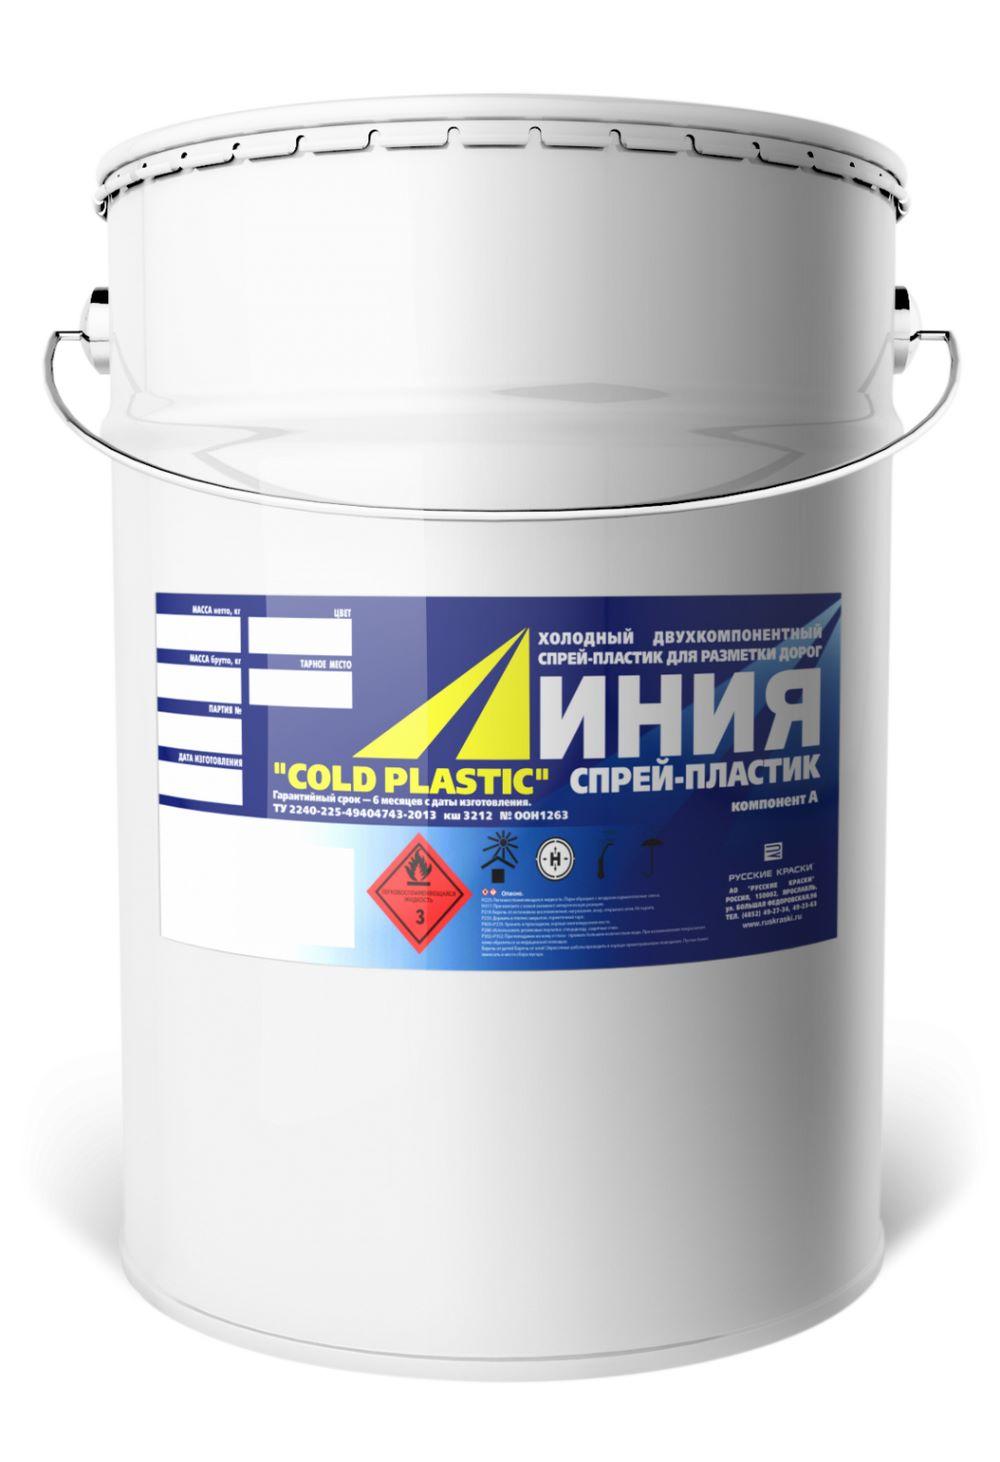 Холодный пластик Highway Cold Plast c отвердителем 1 % желтый, 30 кг